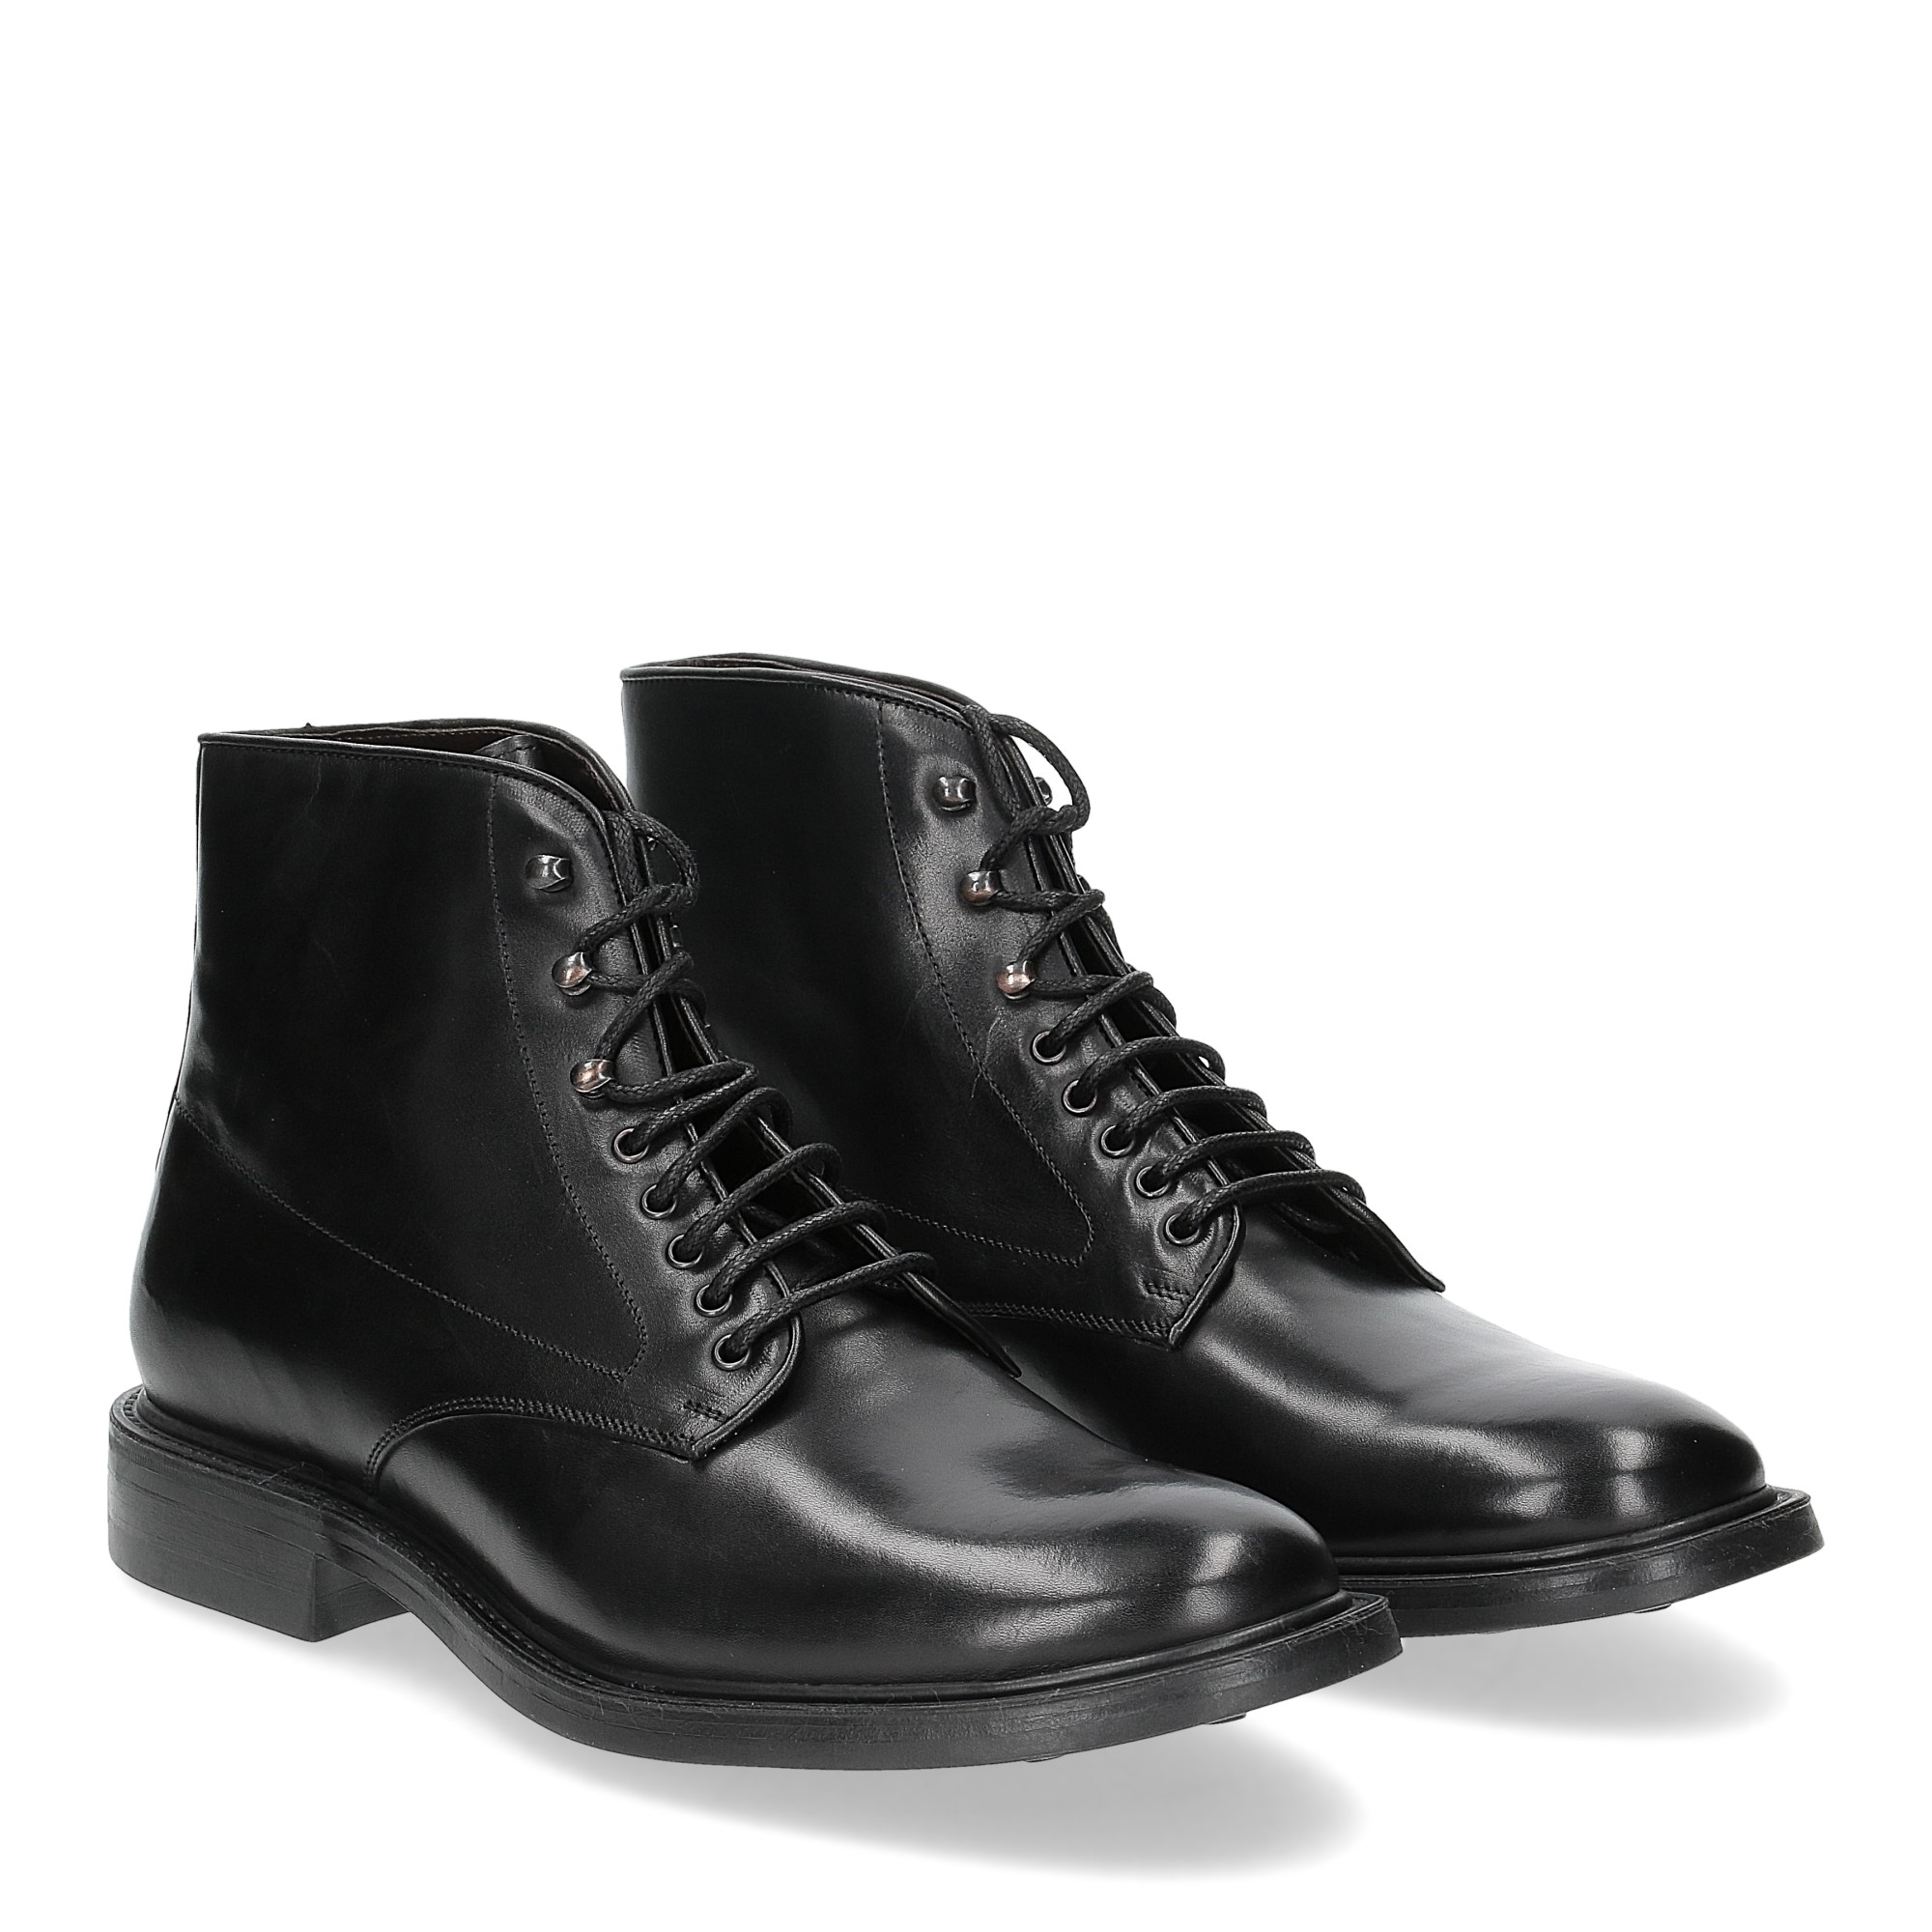 J. Colnett Anfibio 9098 pelle nera